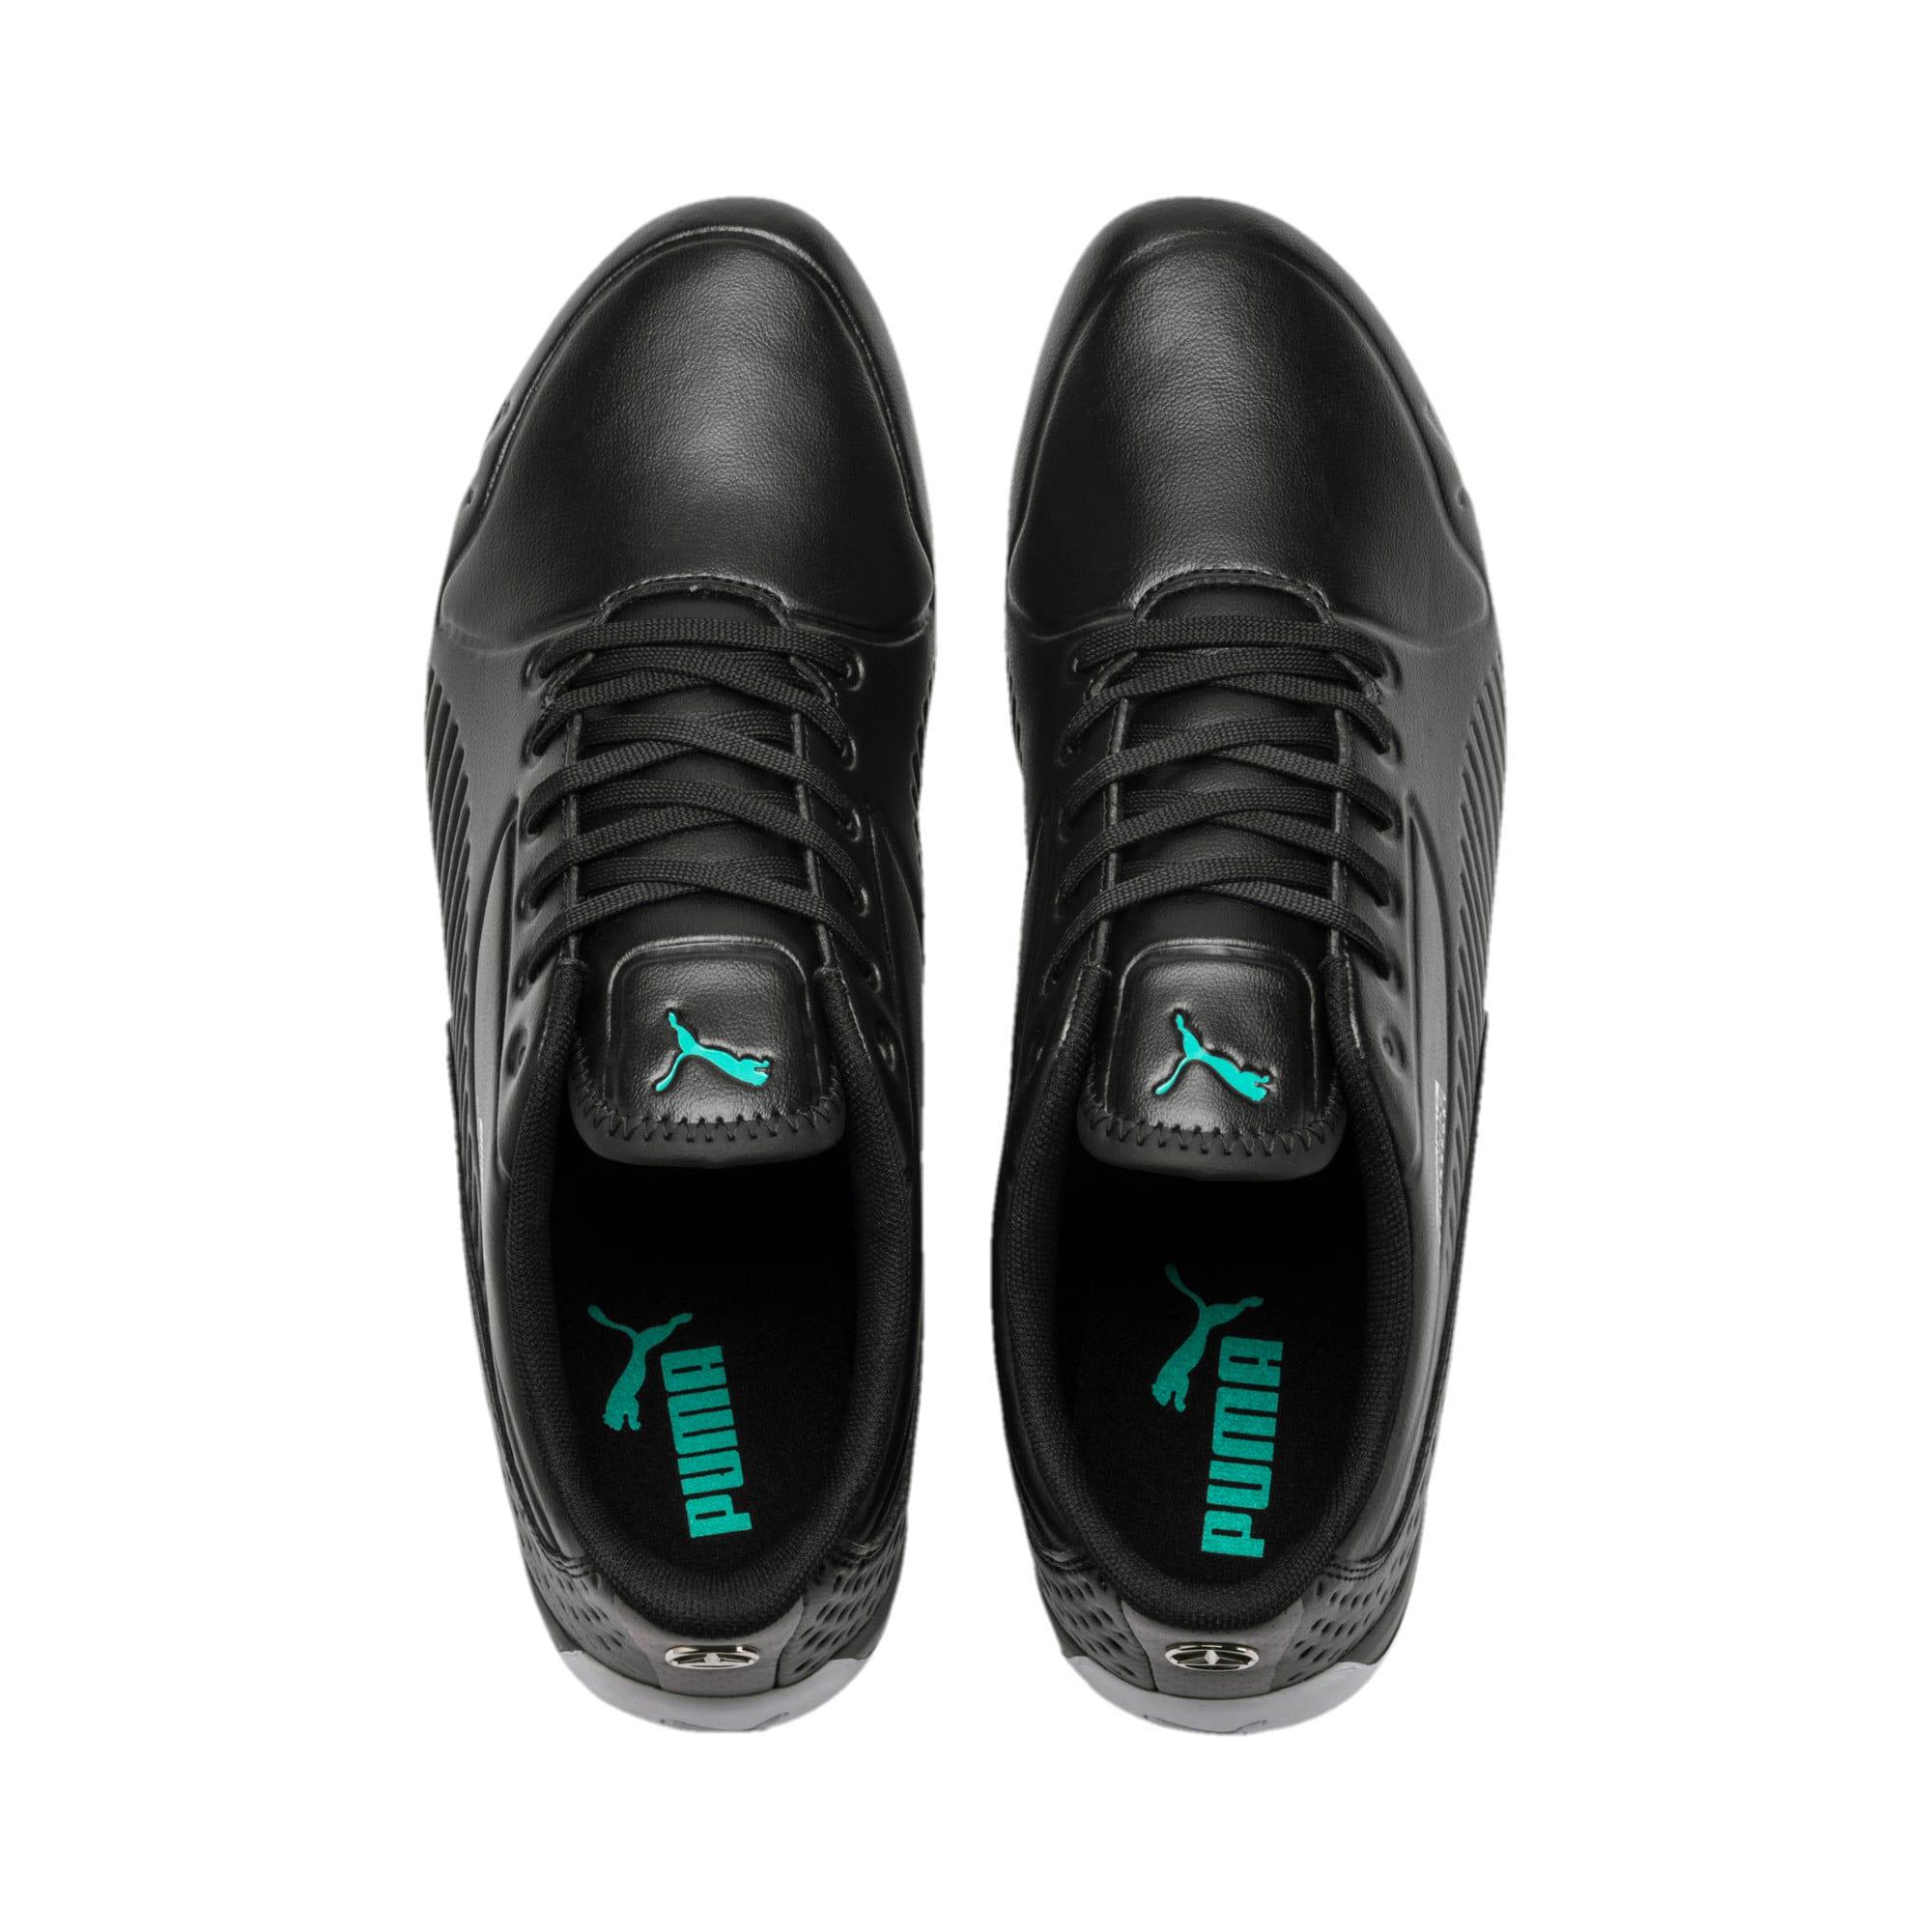 Thumbnail 7 of Mercedes AMG Petronas Drift Cat 7S Ultra Men's Shoes, Puma Black-Puma Black, medium